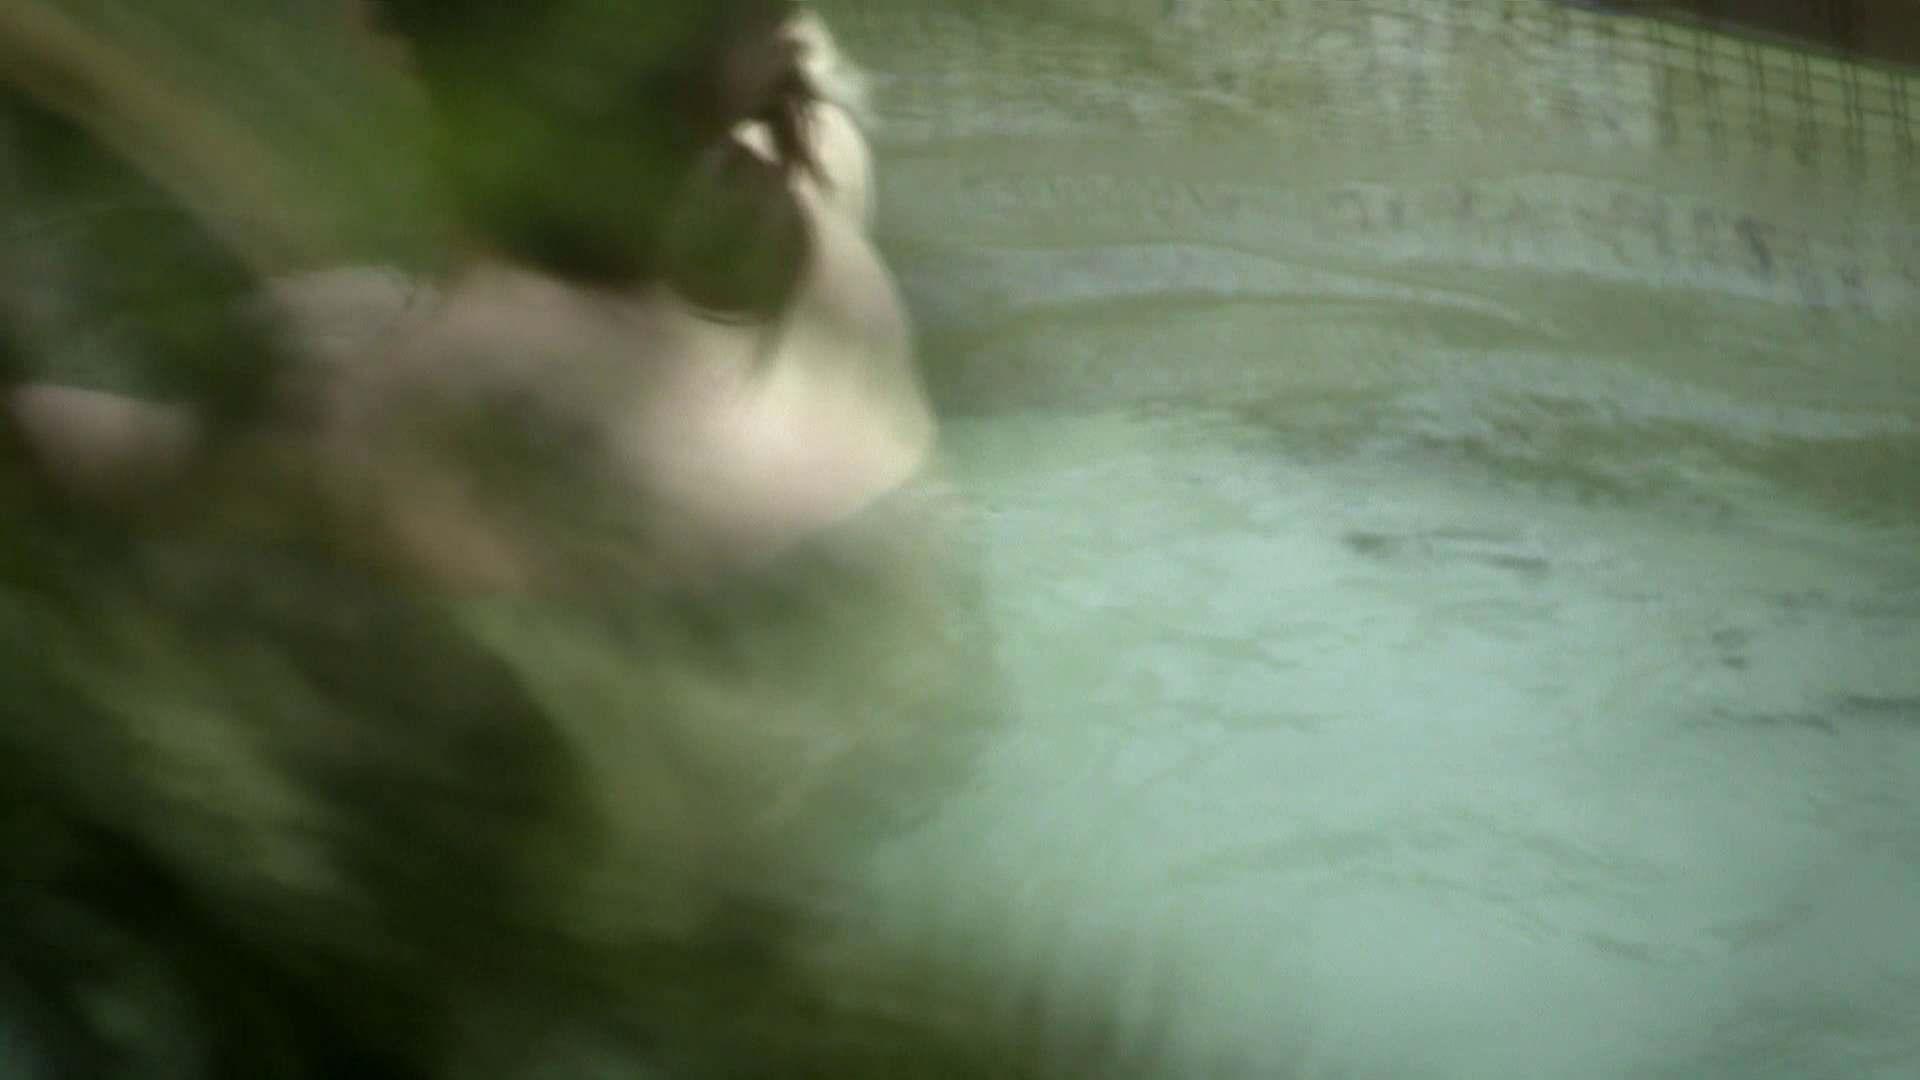 Aquaな露天風呂Vol.652 盗撮 | HなOL  105pic 66